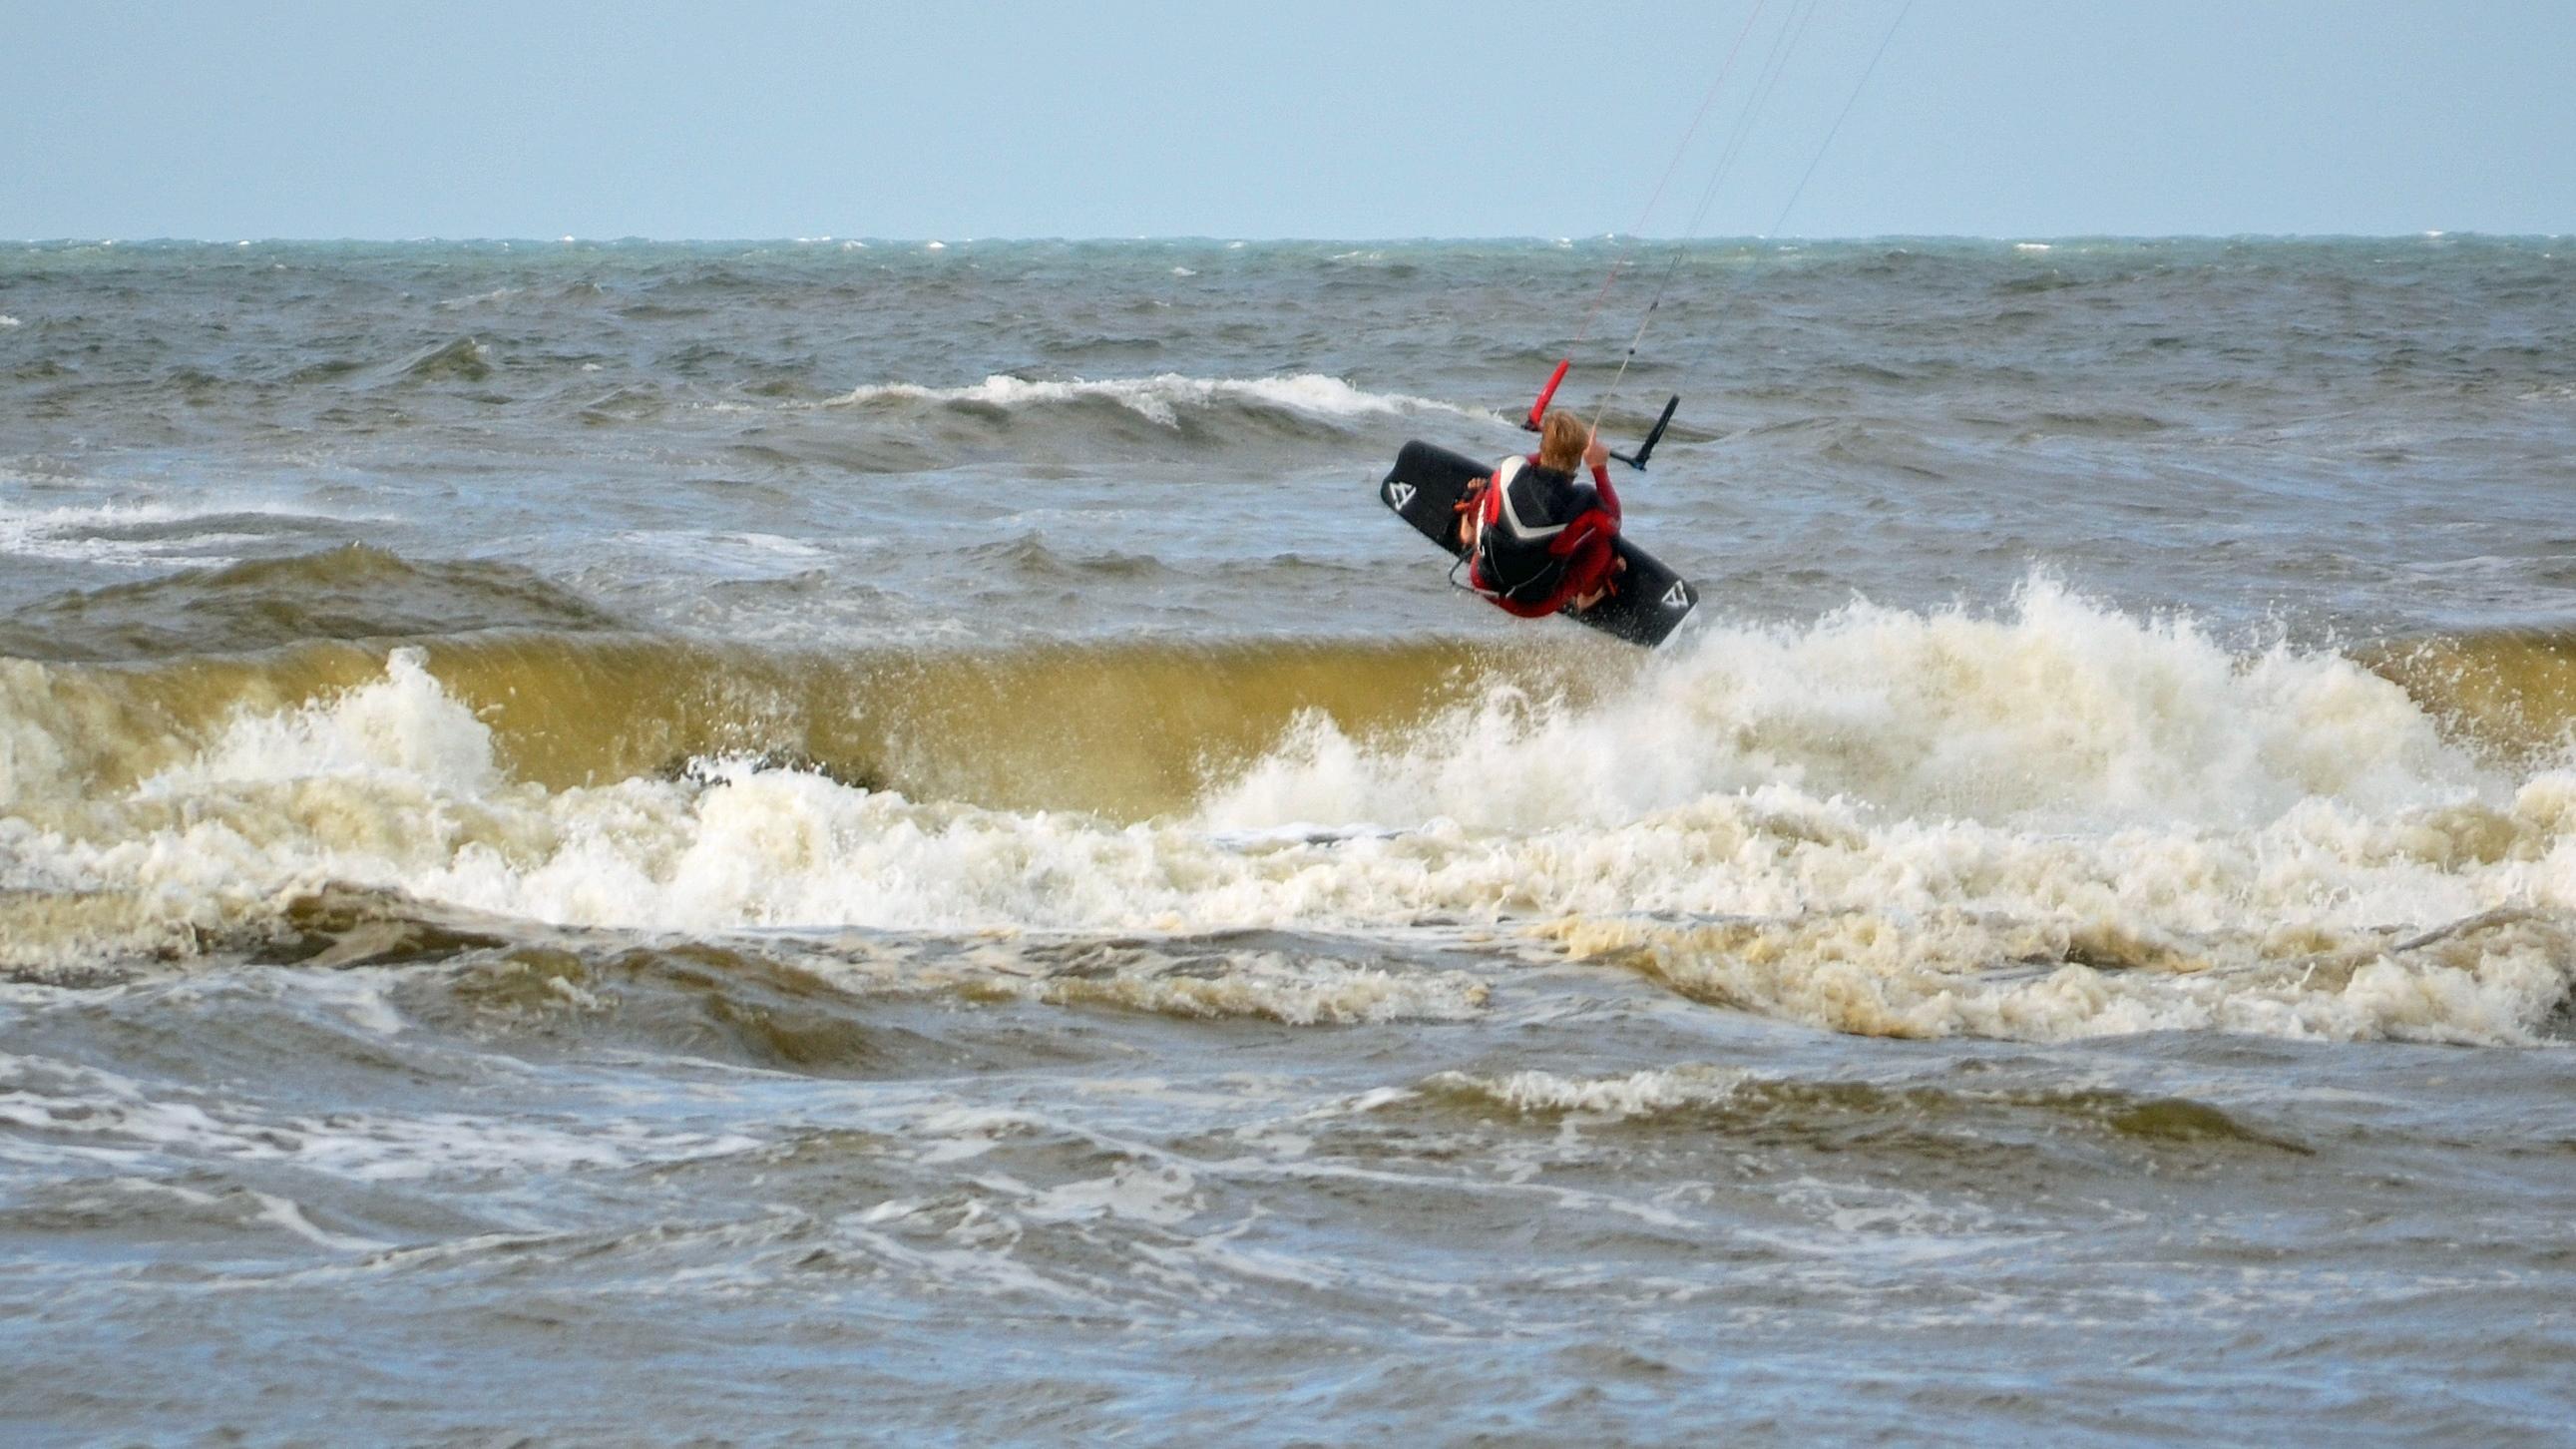 Het was prima Kitesurfweer, windkracht 5 en een lekkere temperatuur (Foto: Sjef Kenniphaas).